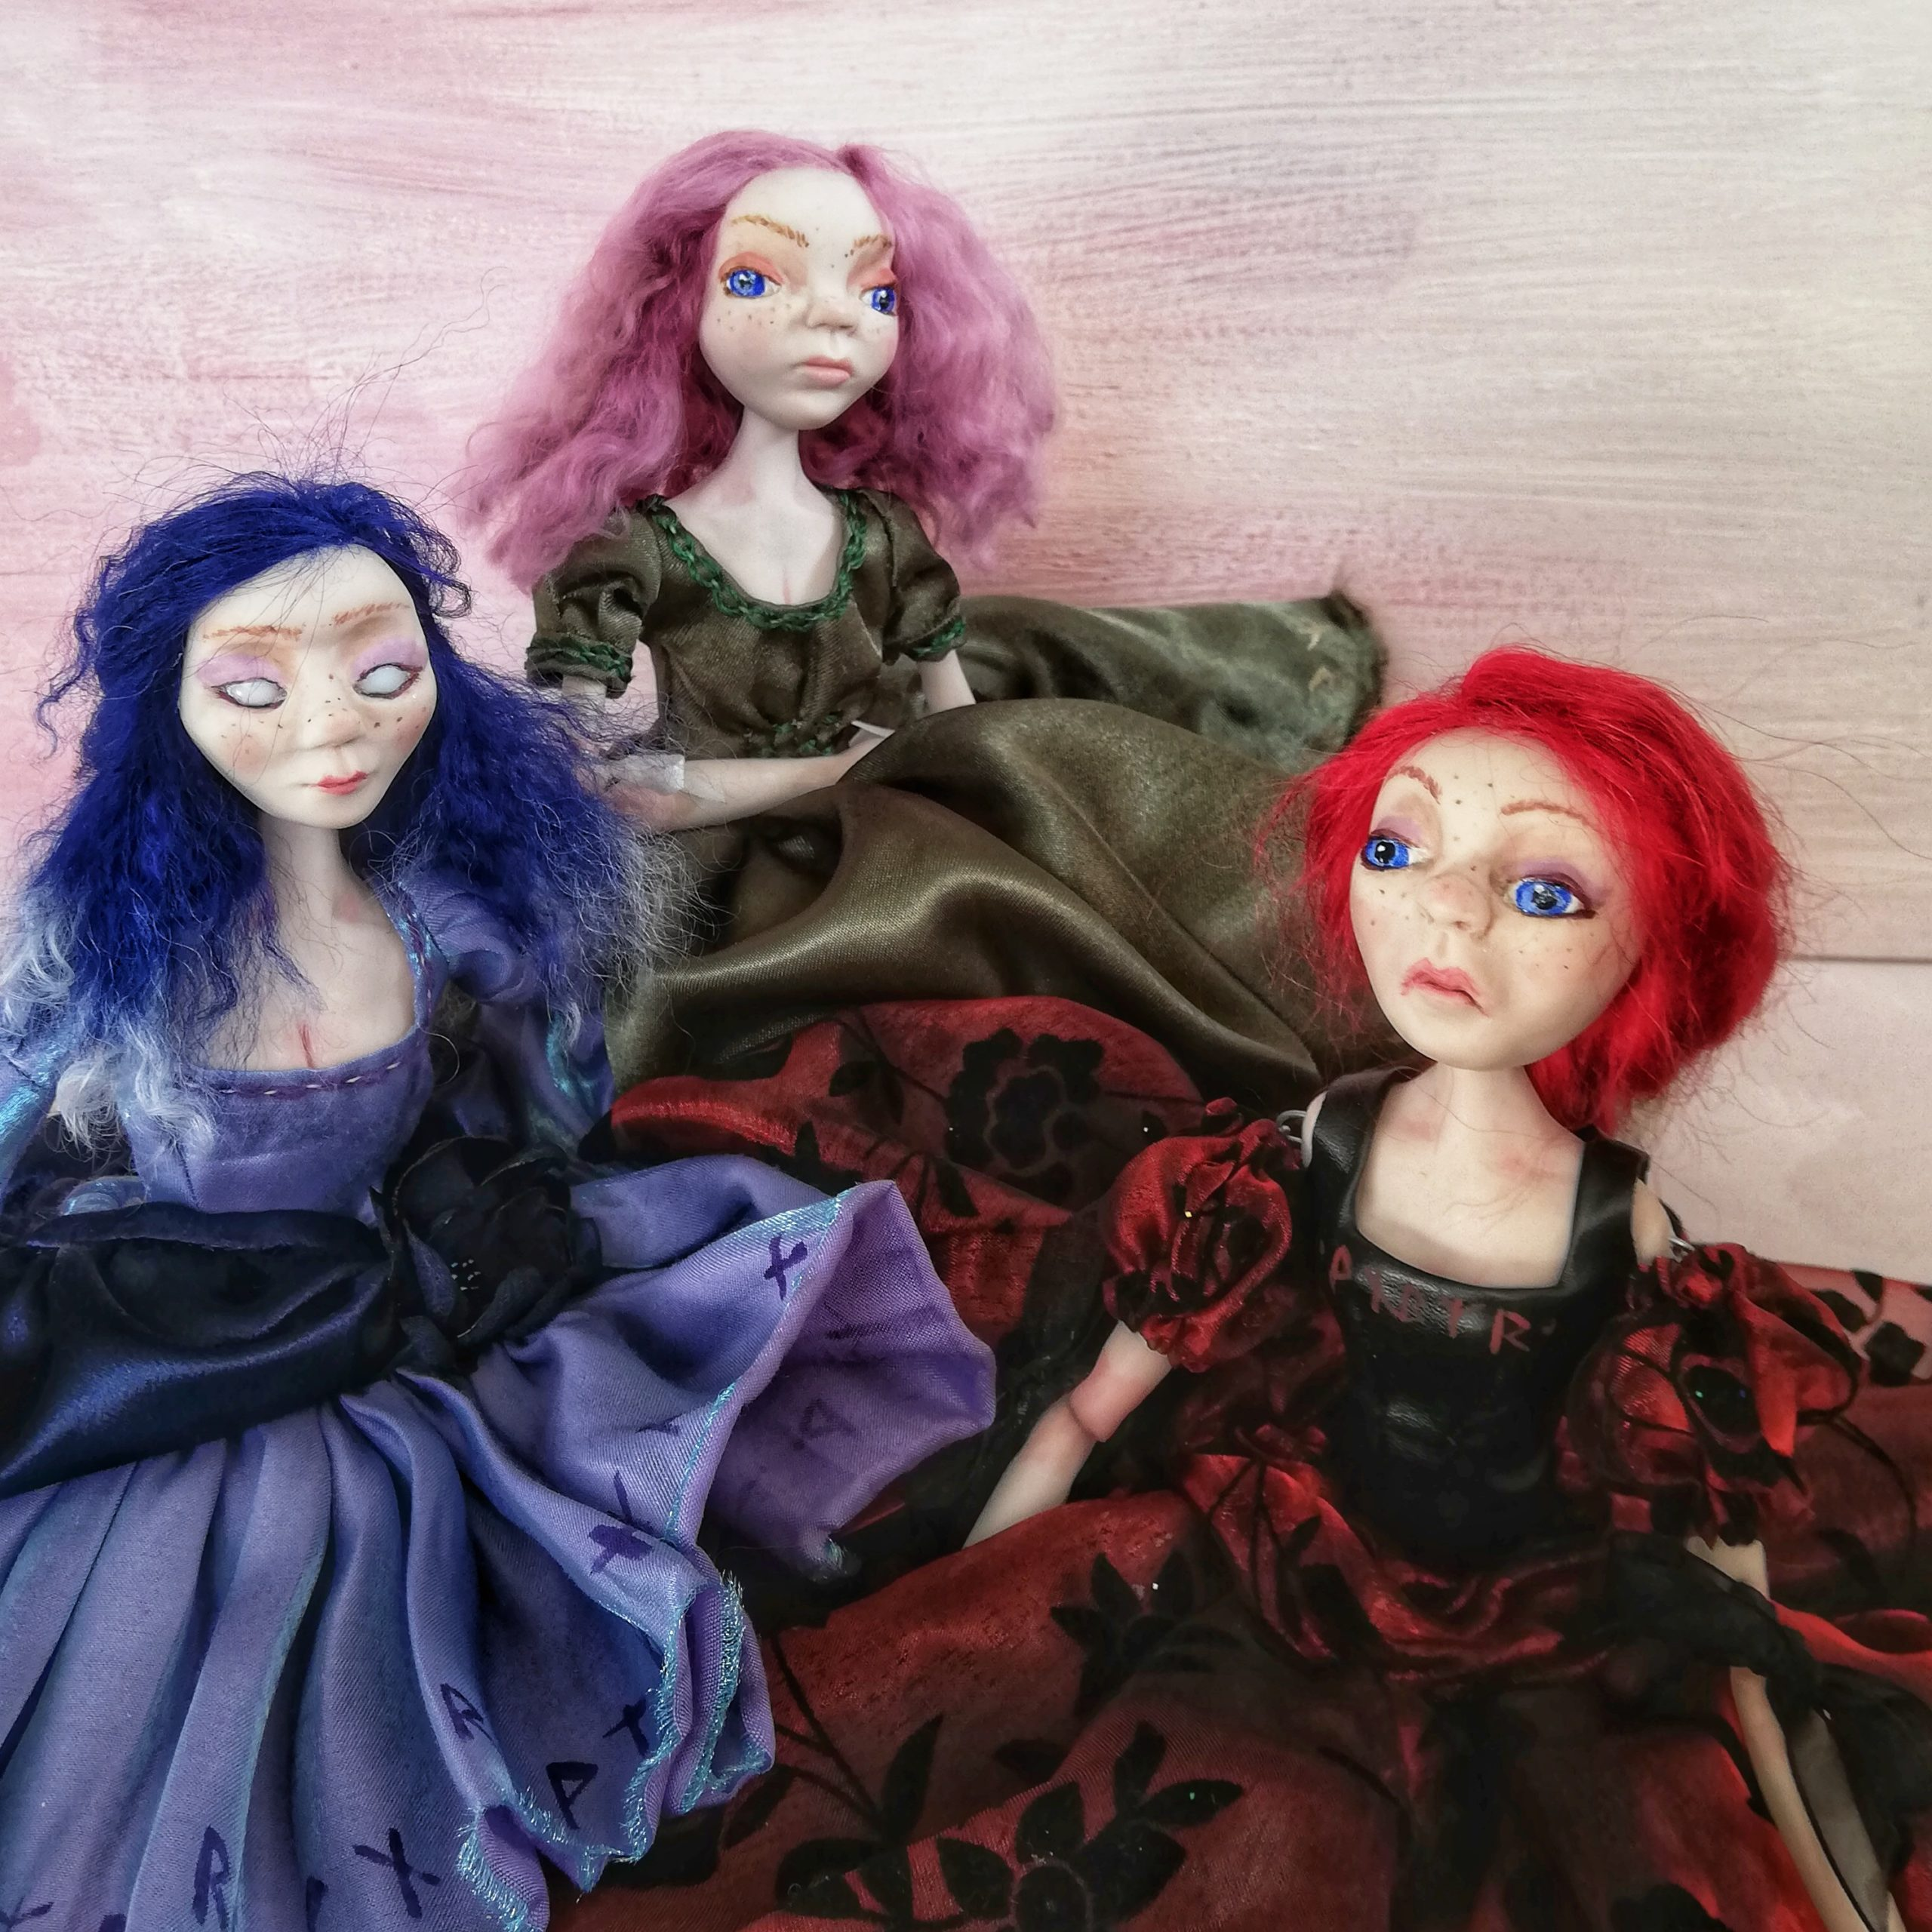 Art dolls for the dark Christmas show